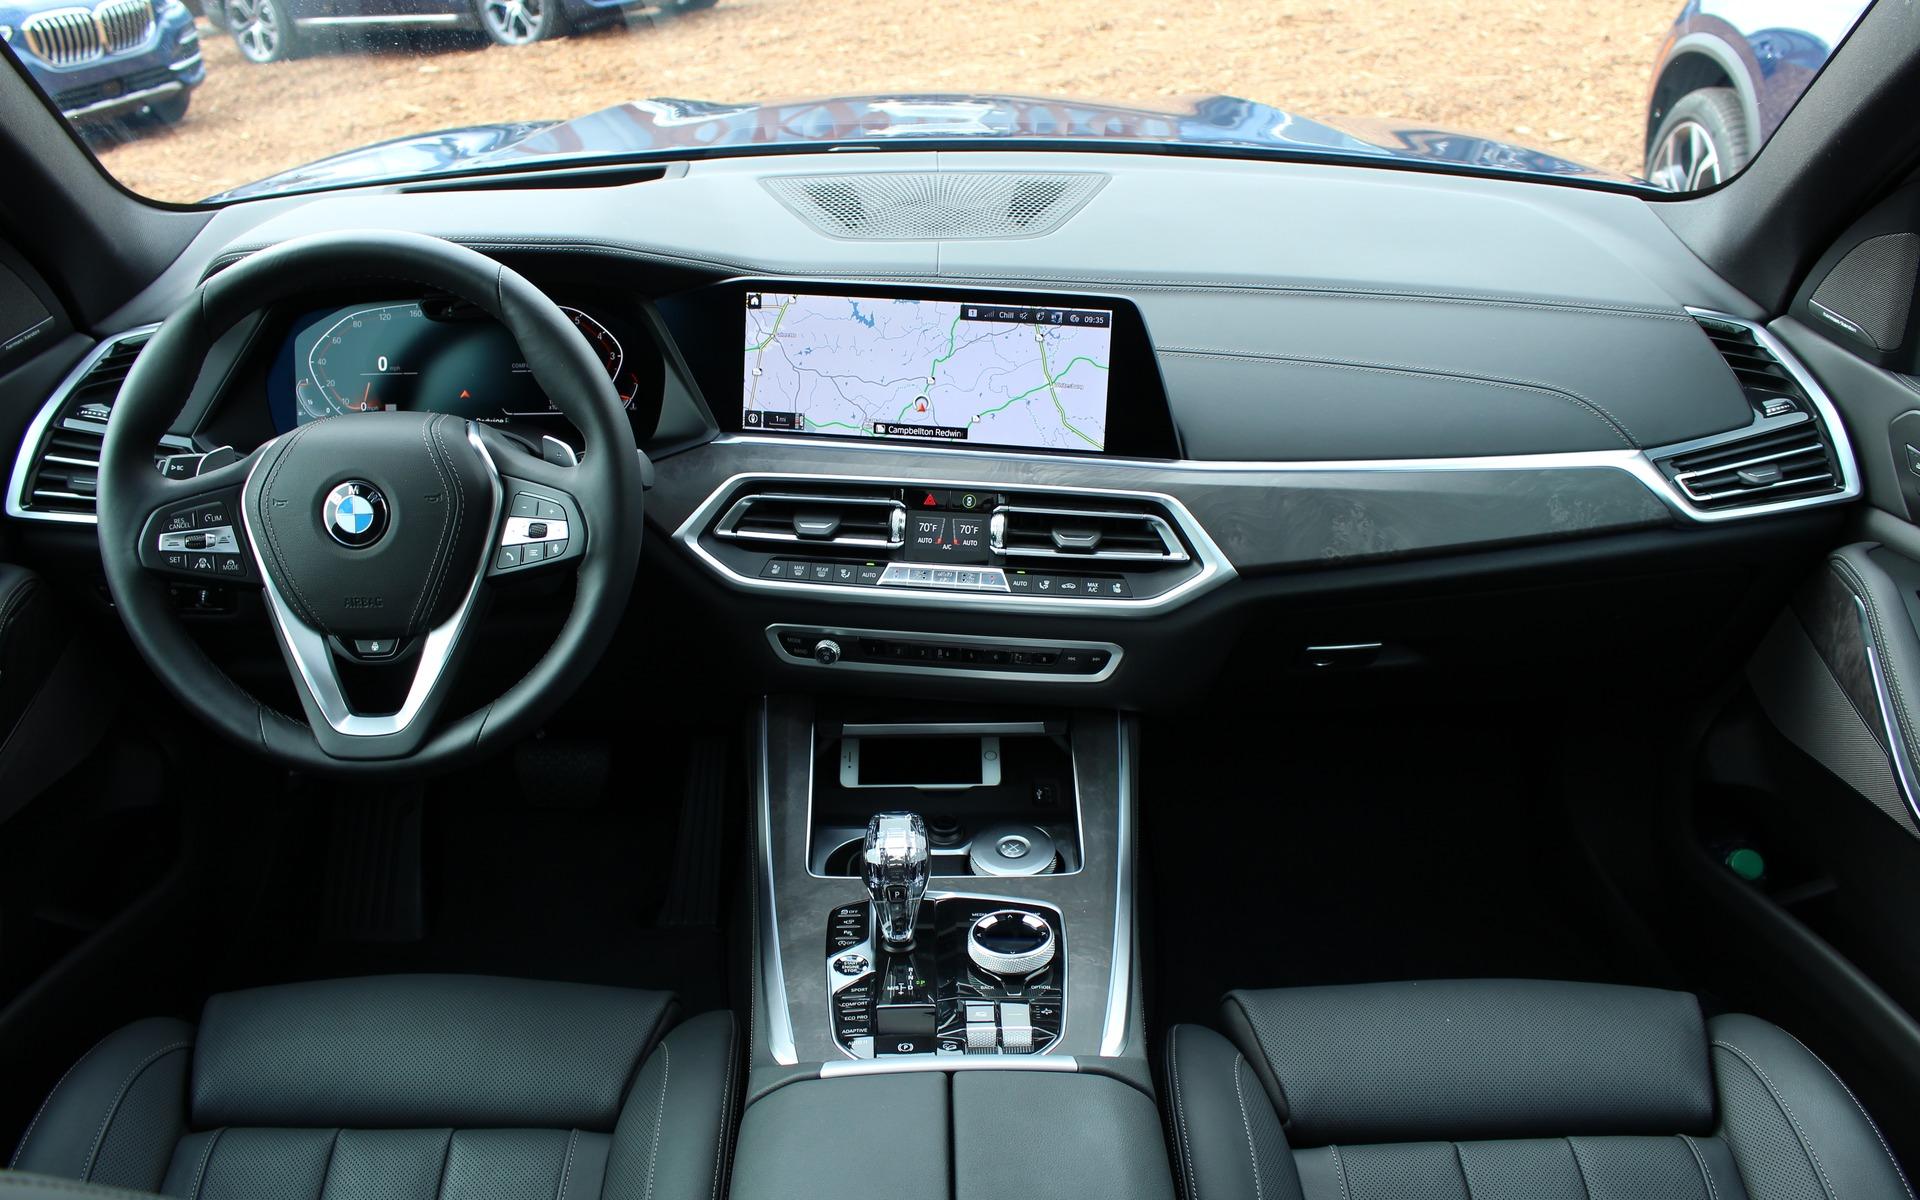 BMW X5 2019 : évolution technologique 349916_2019_BMW_X5